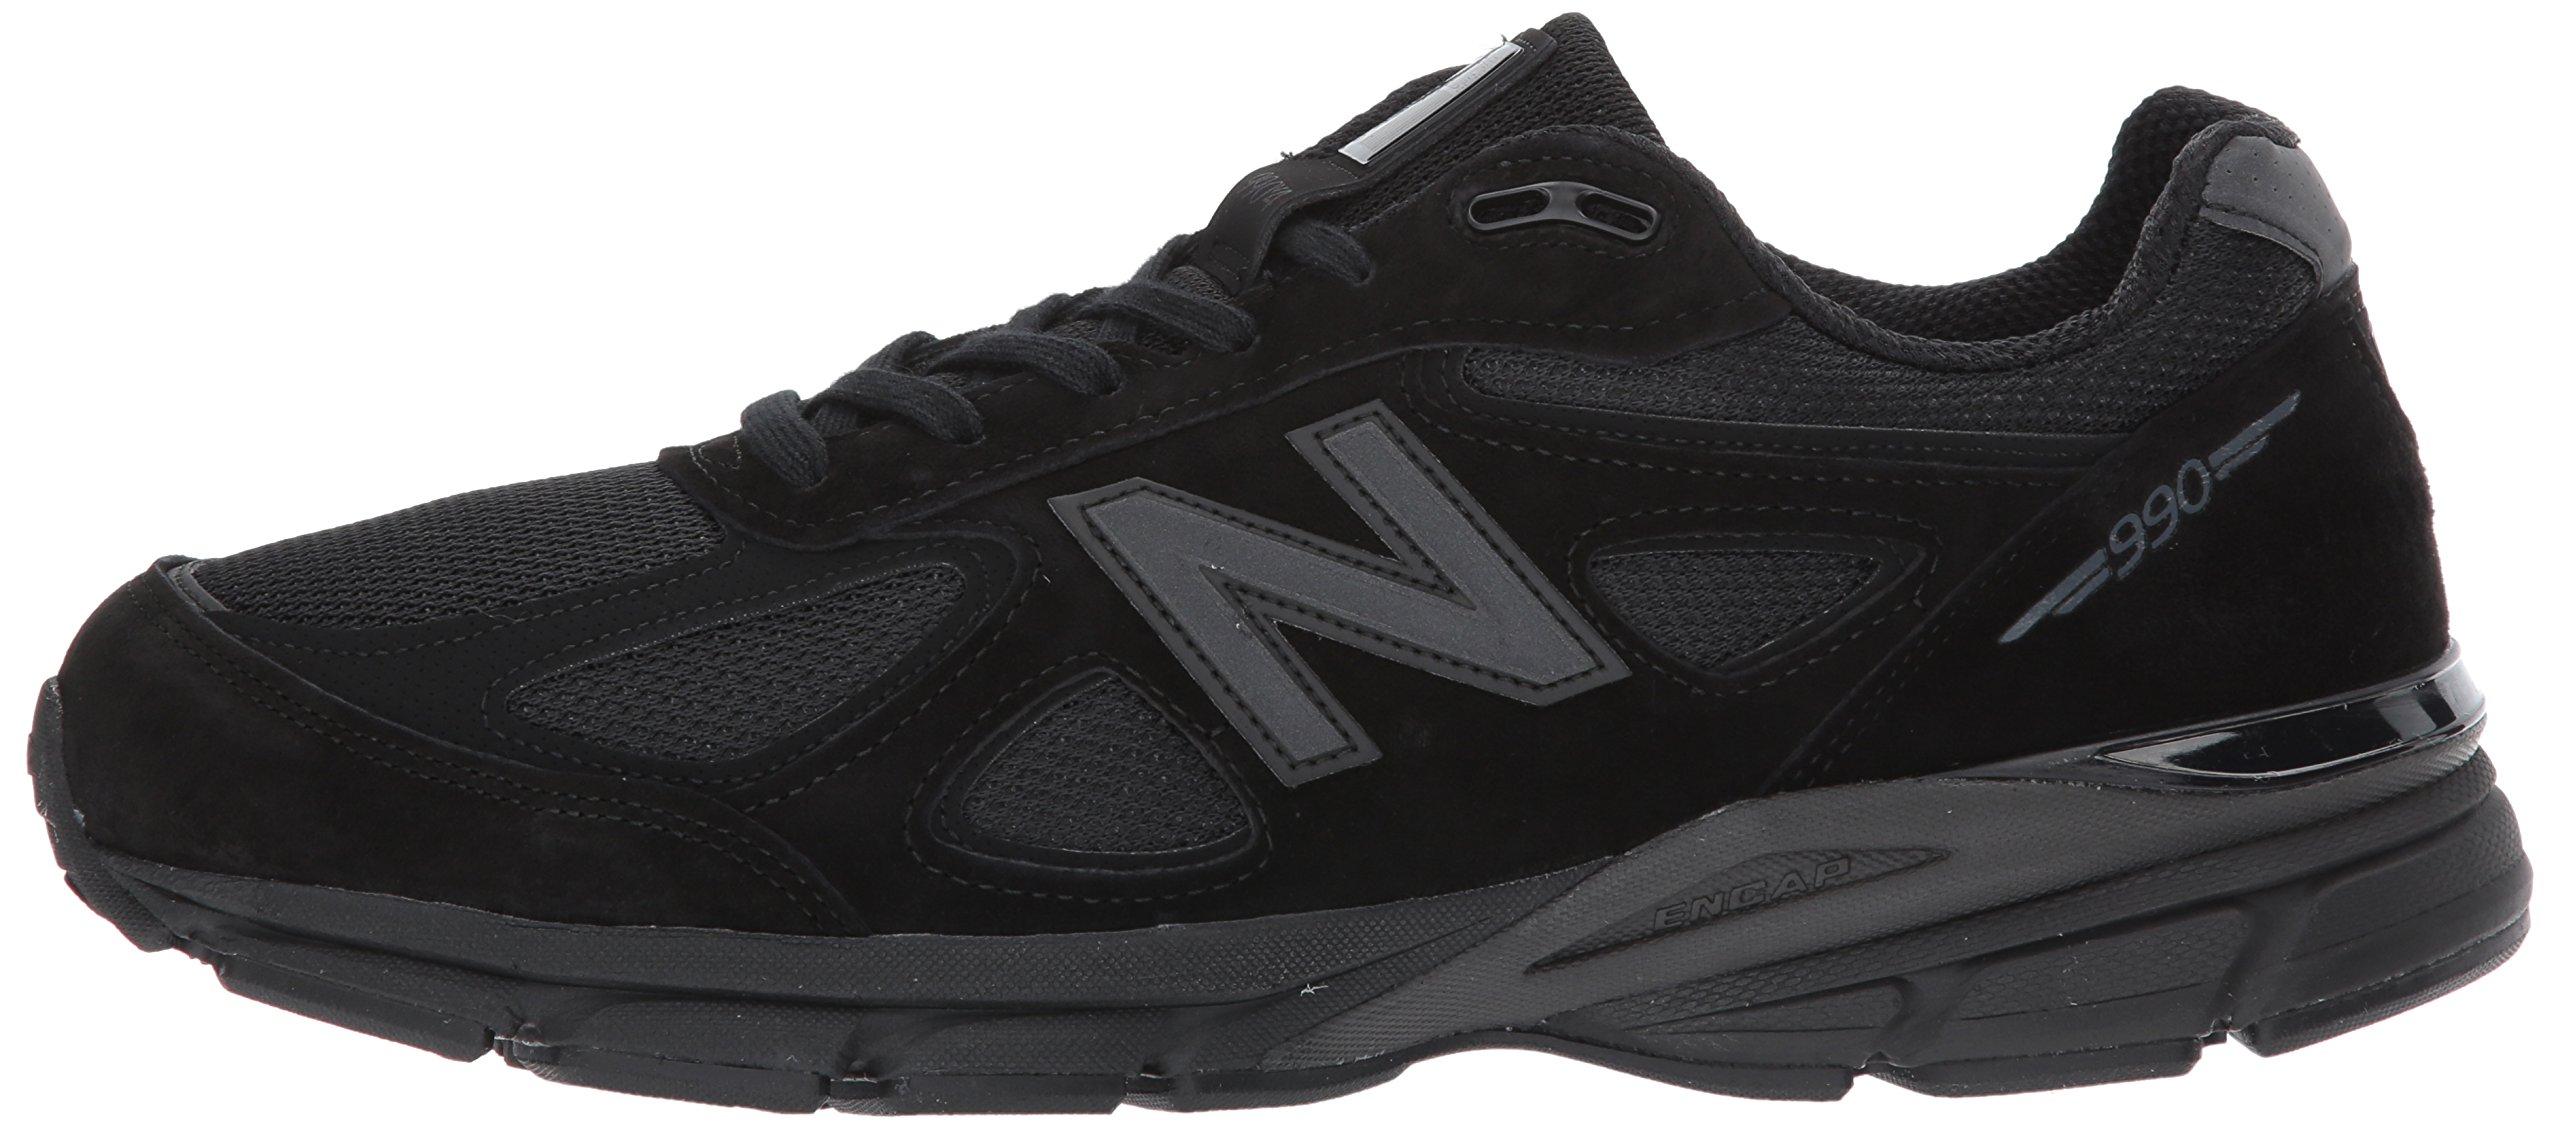 New Balance Men's 990V4 Running Shoe, Black/Black, 11 2E US by New Balance (Image #5)